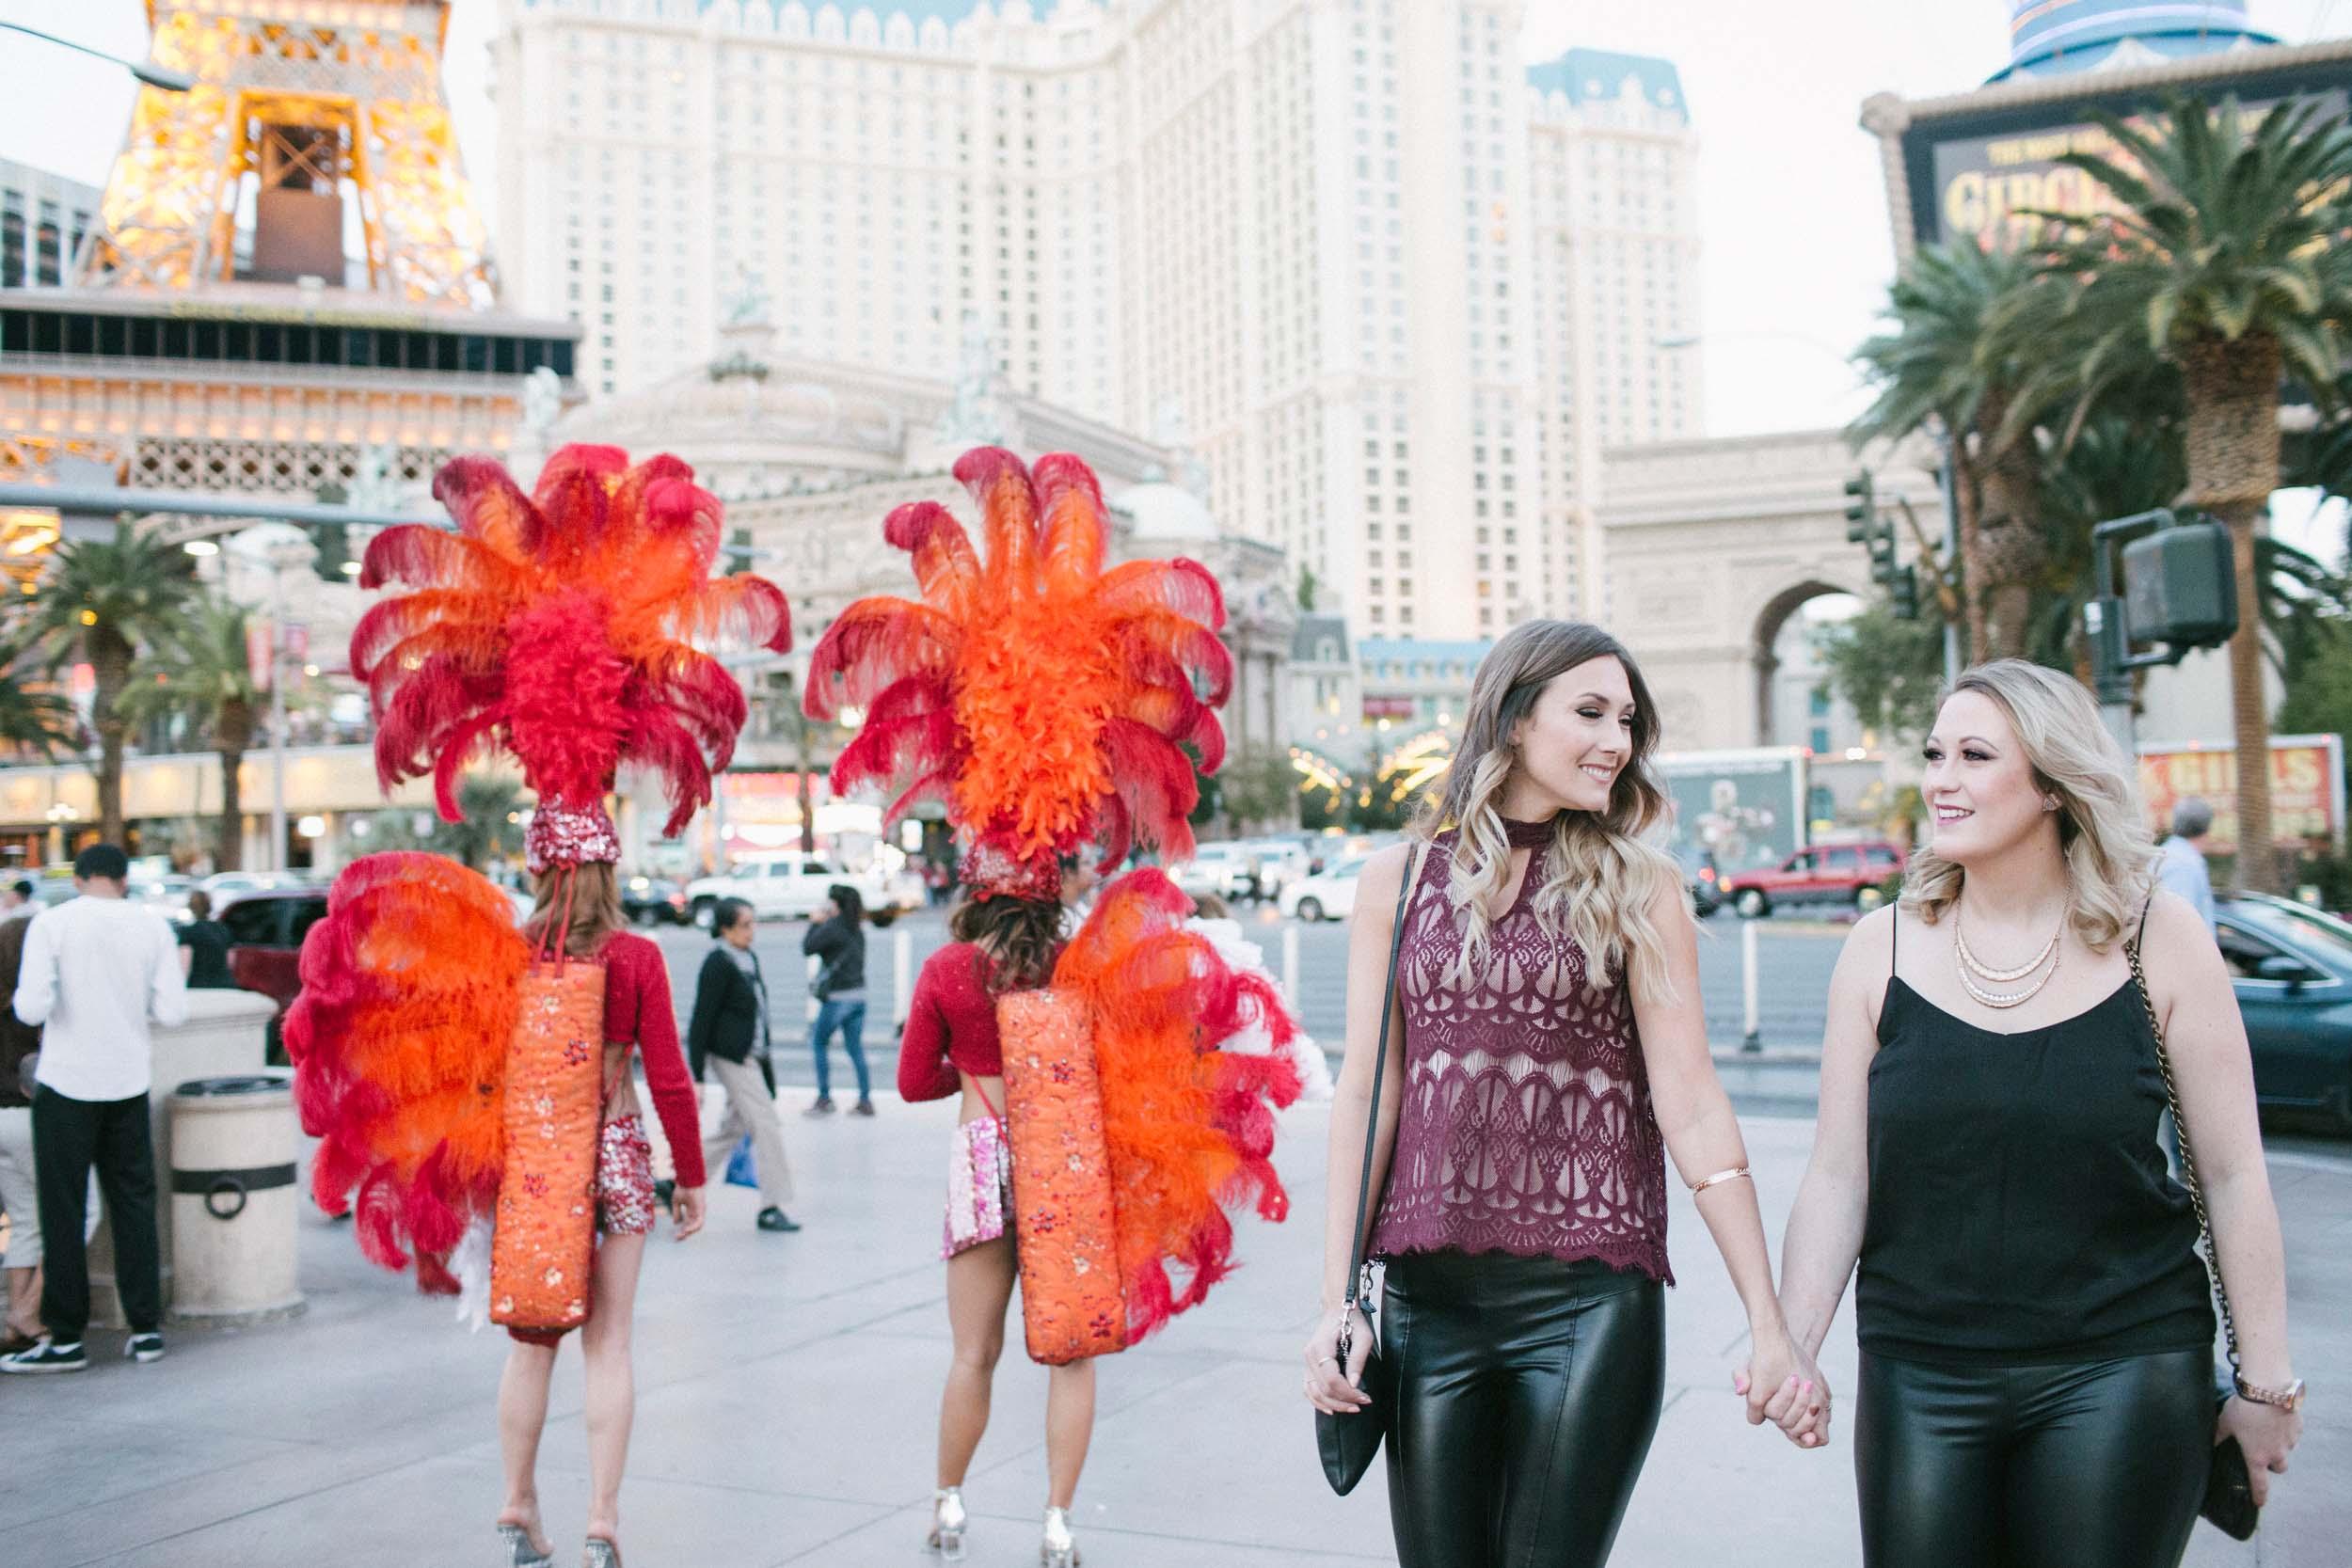 Flytographer Talia in Las Vegas